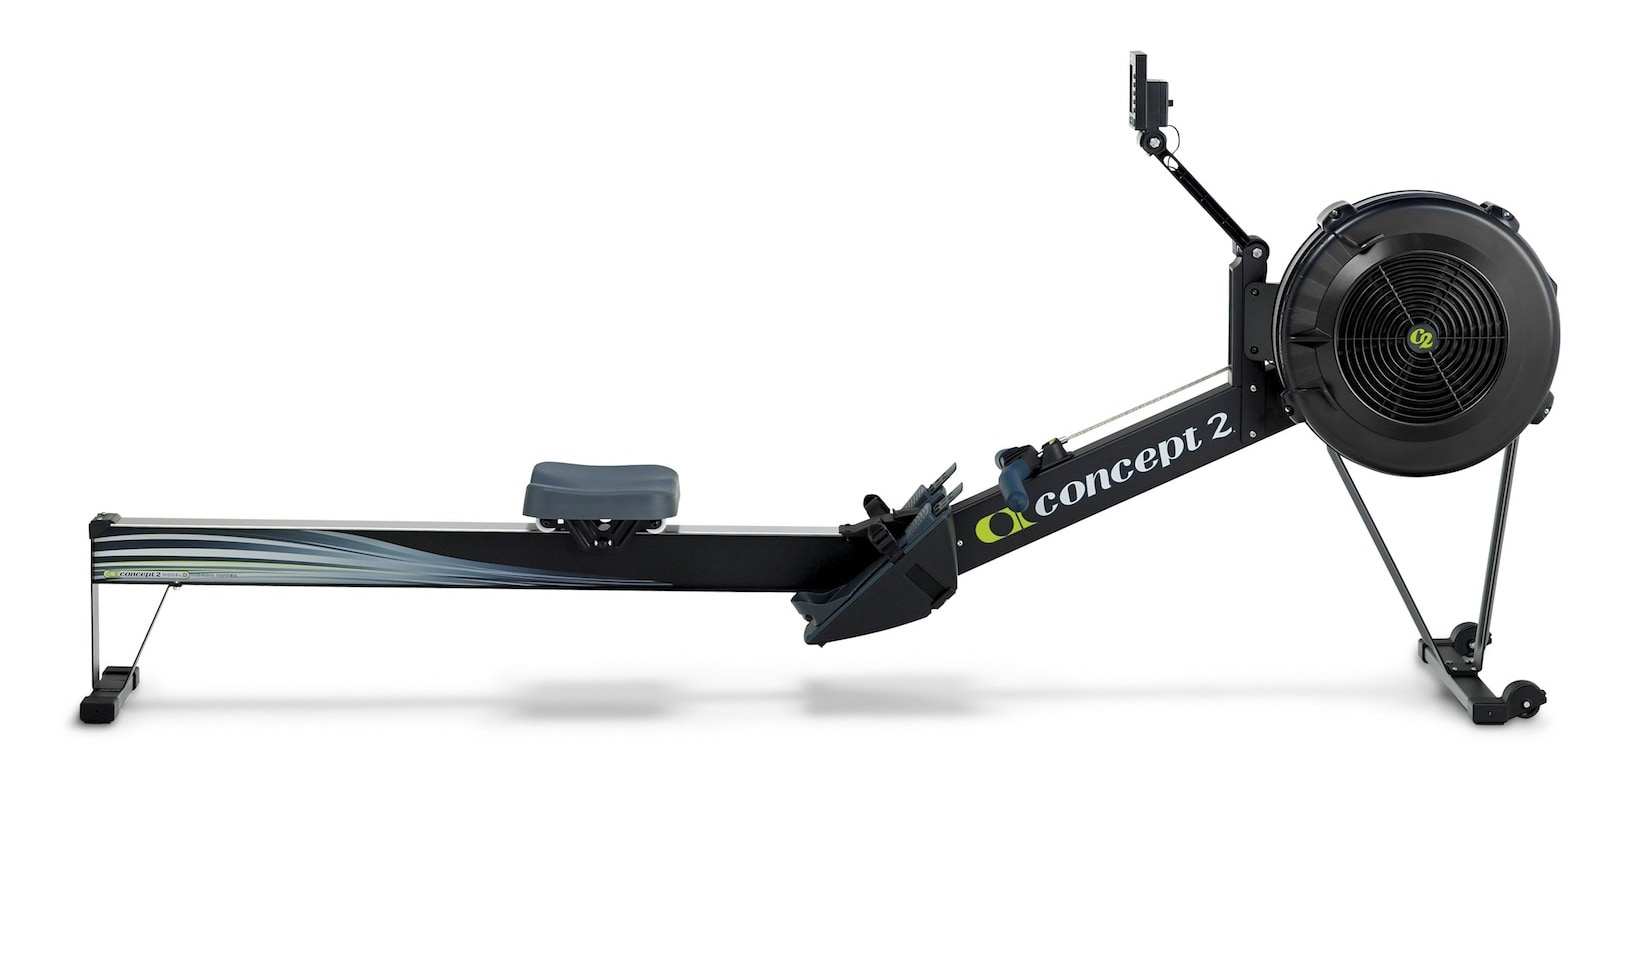 concept-2-rower-black-profile